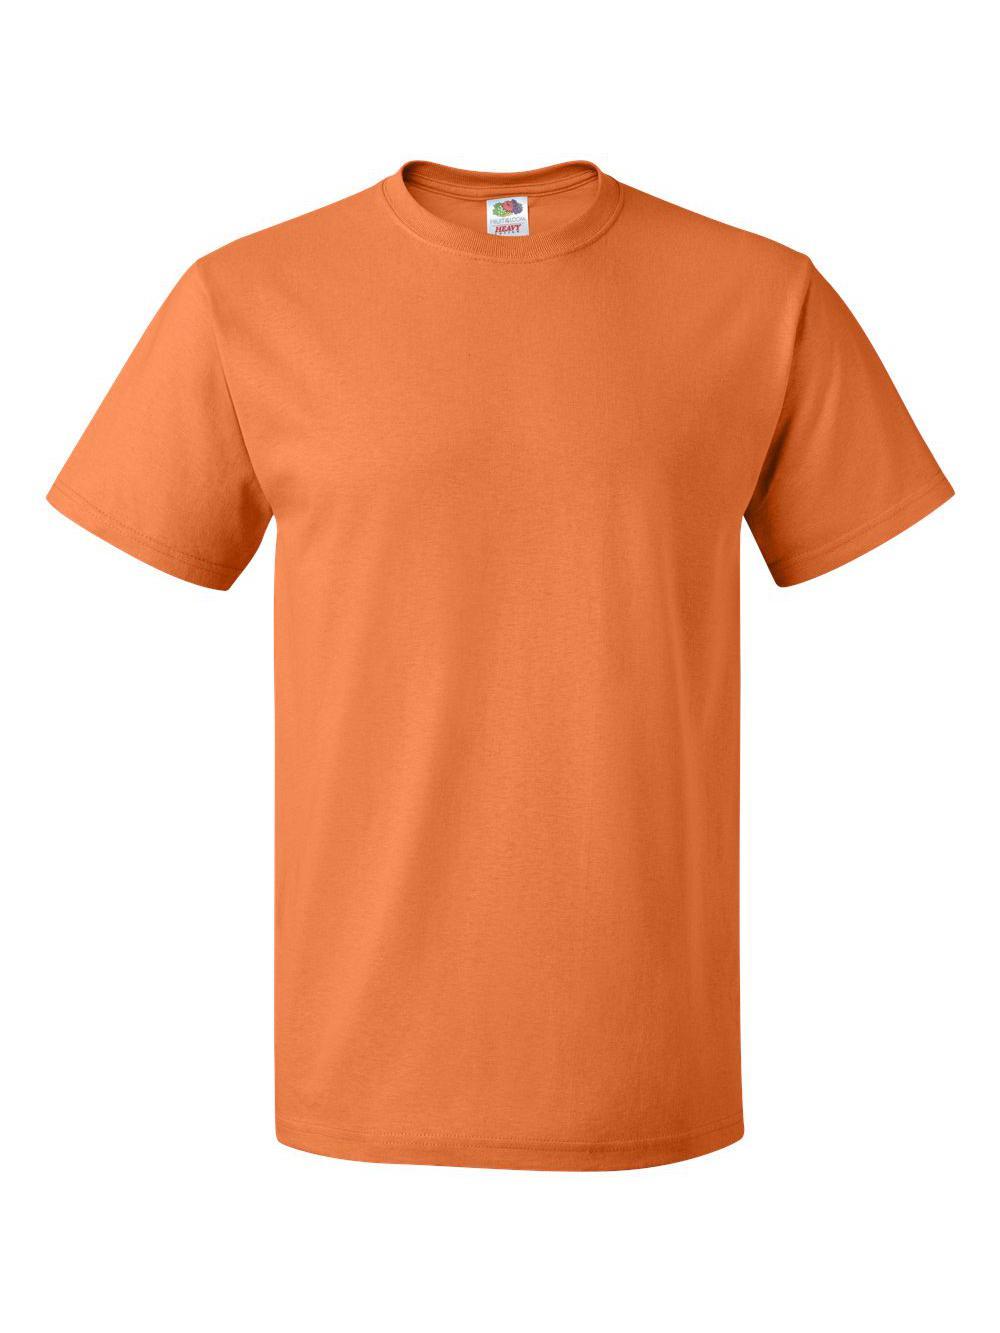 Fruit-of-the-Loom-HD-Cotton-Short-Sleeve-T-Shirt-3930R thumbnail 129